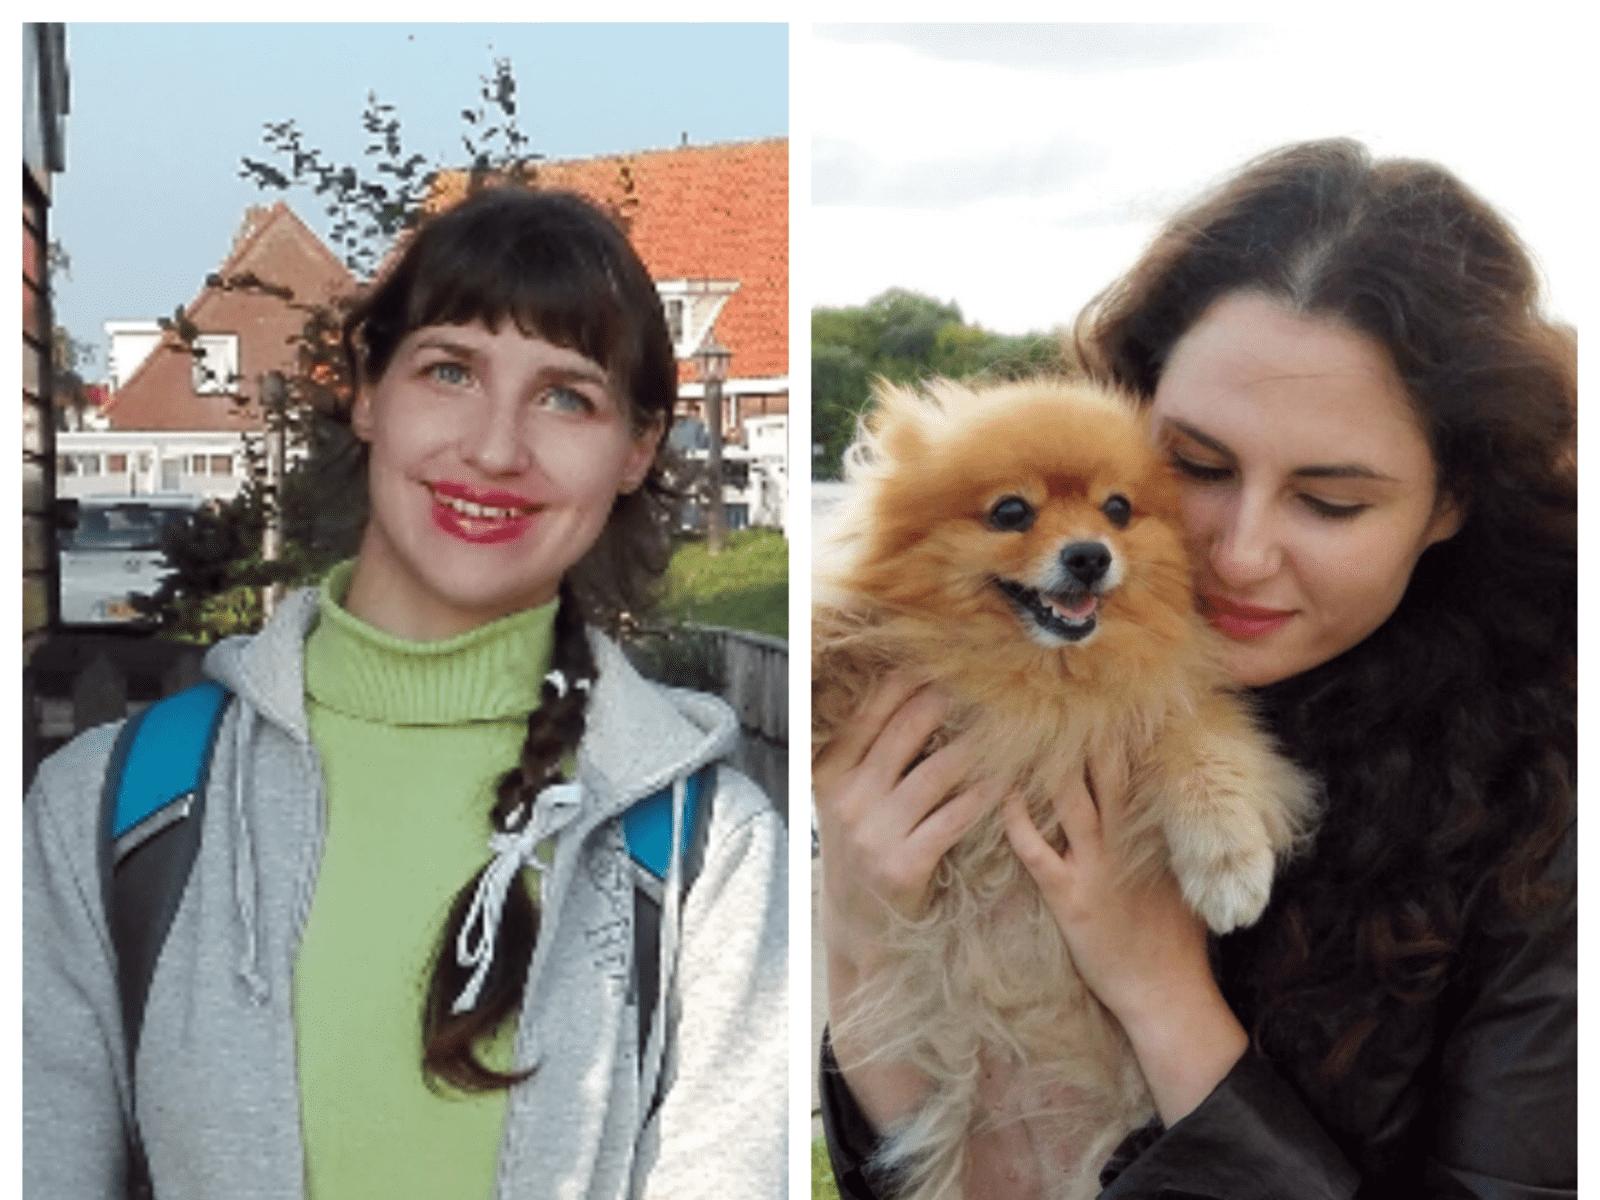 Ksenia & Natalia from Moscow, Russia